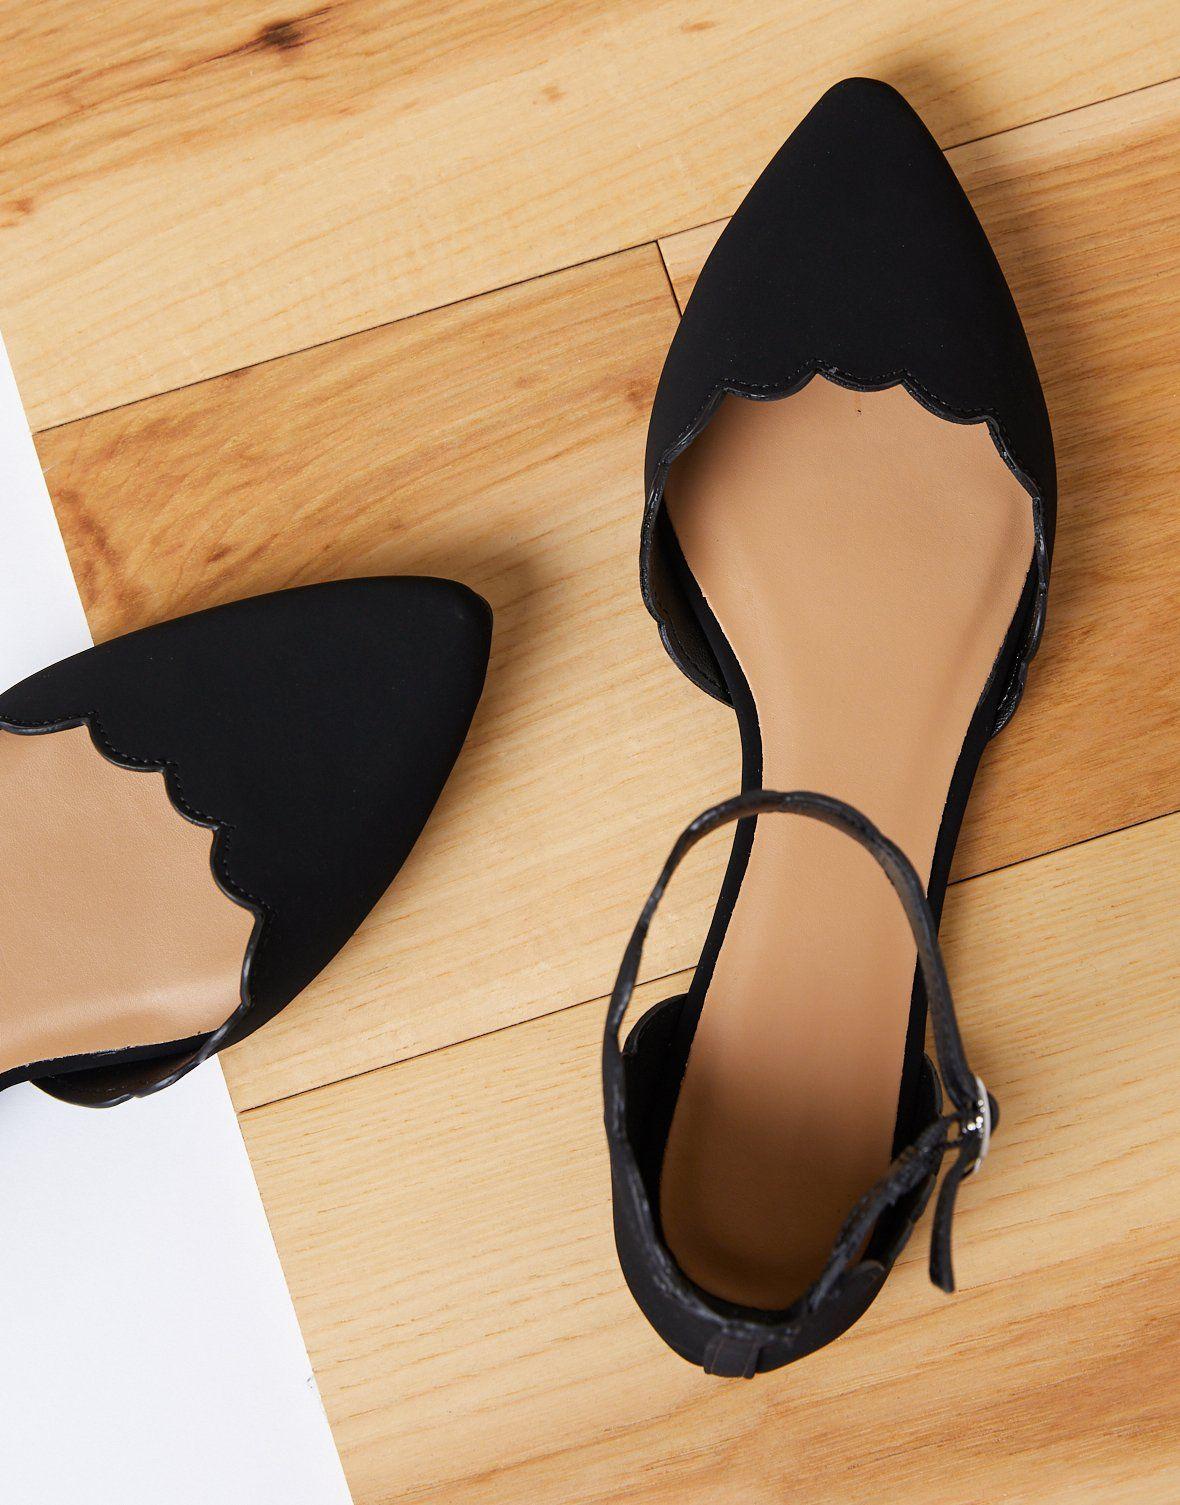 c146e5809f Ladylike Flats-Pointed Toe Flats With Ankle Straps-Ankle Strap Flats –  2020AVE pointed